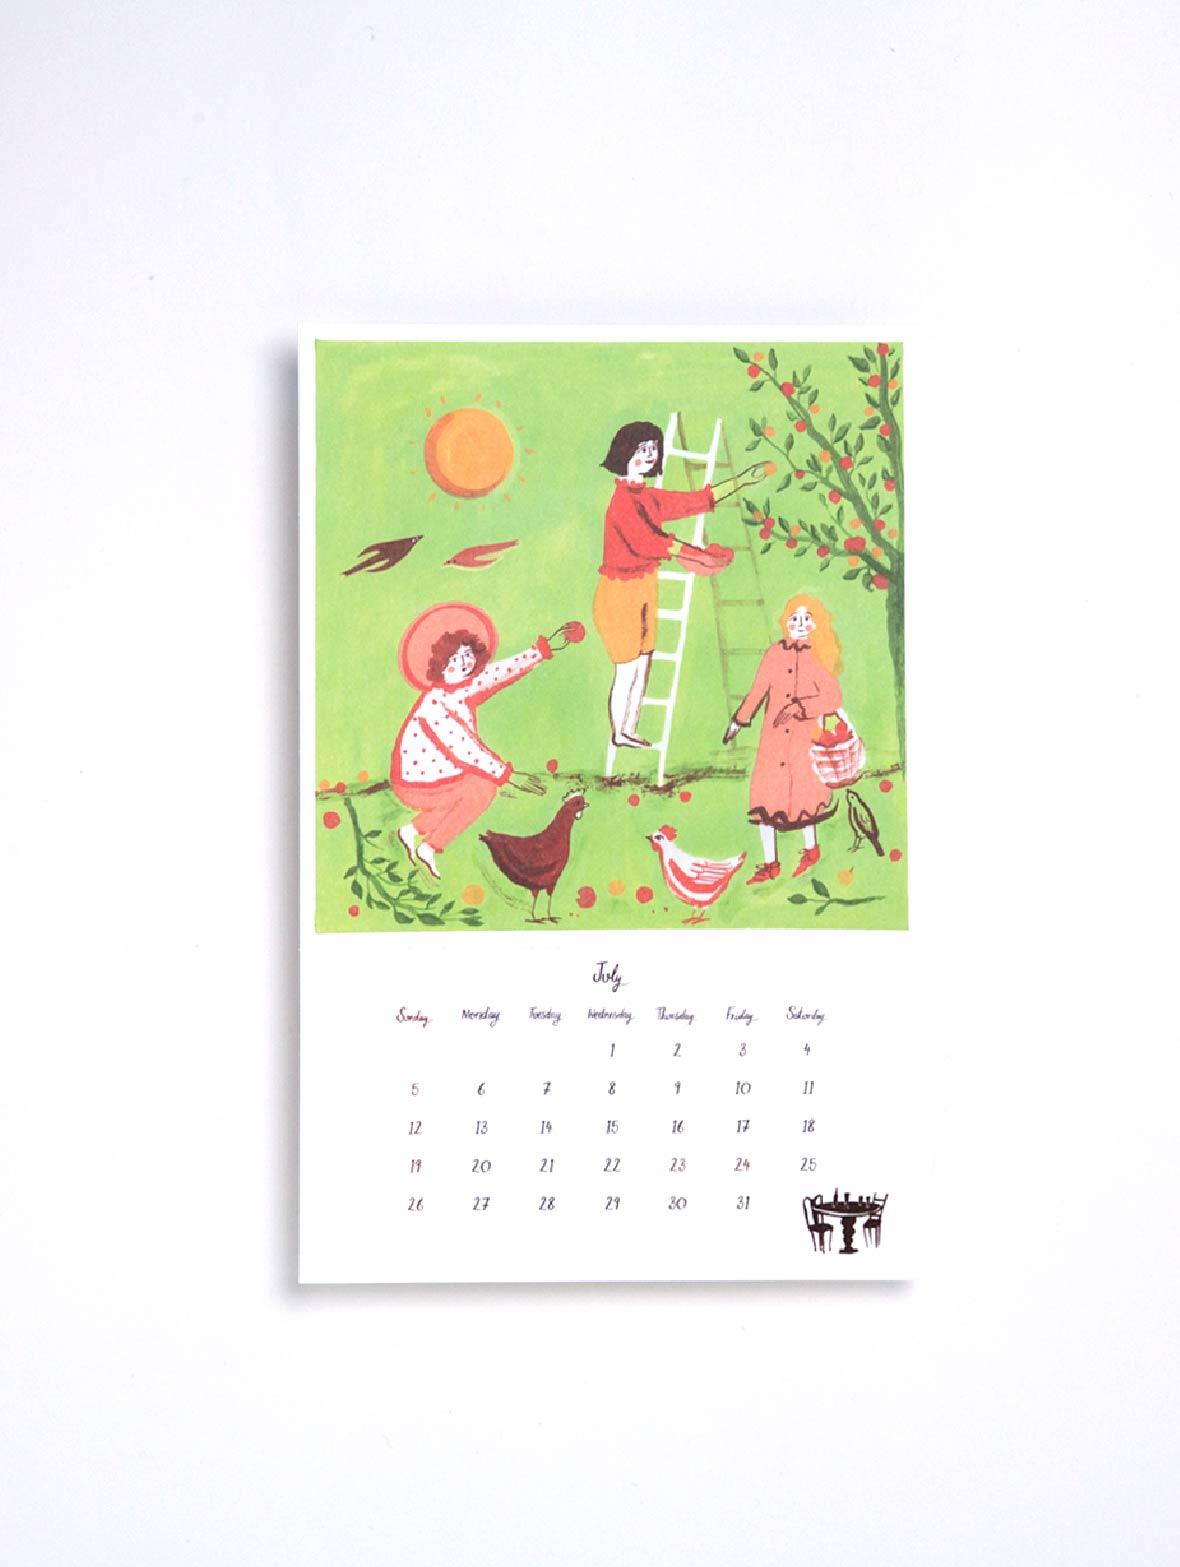 【TK】ポーリー・ファーン 2020 カレンダー